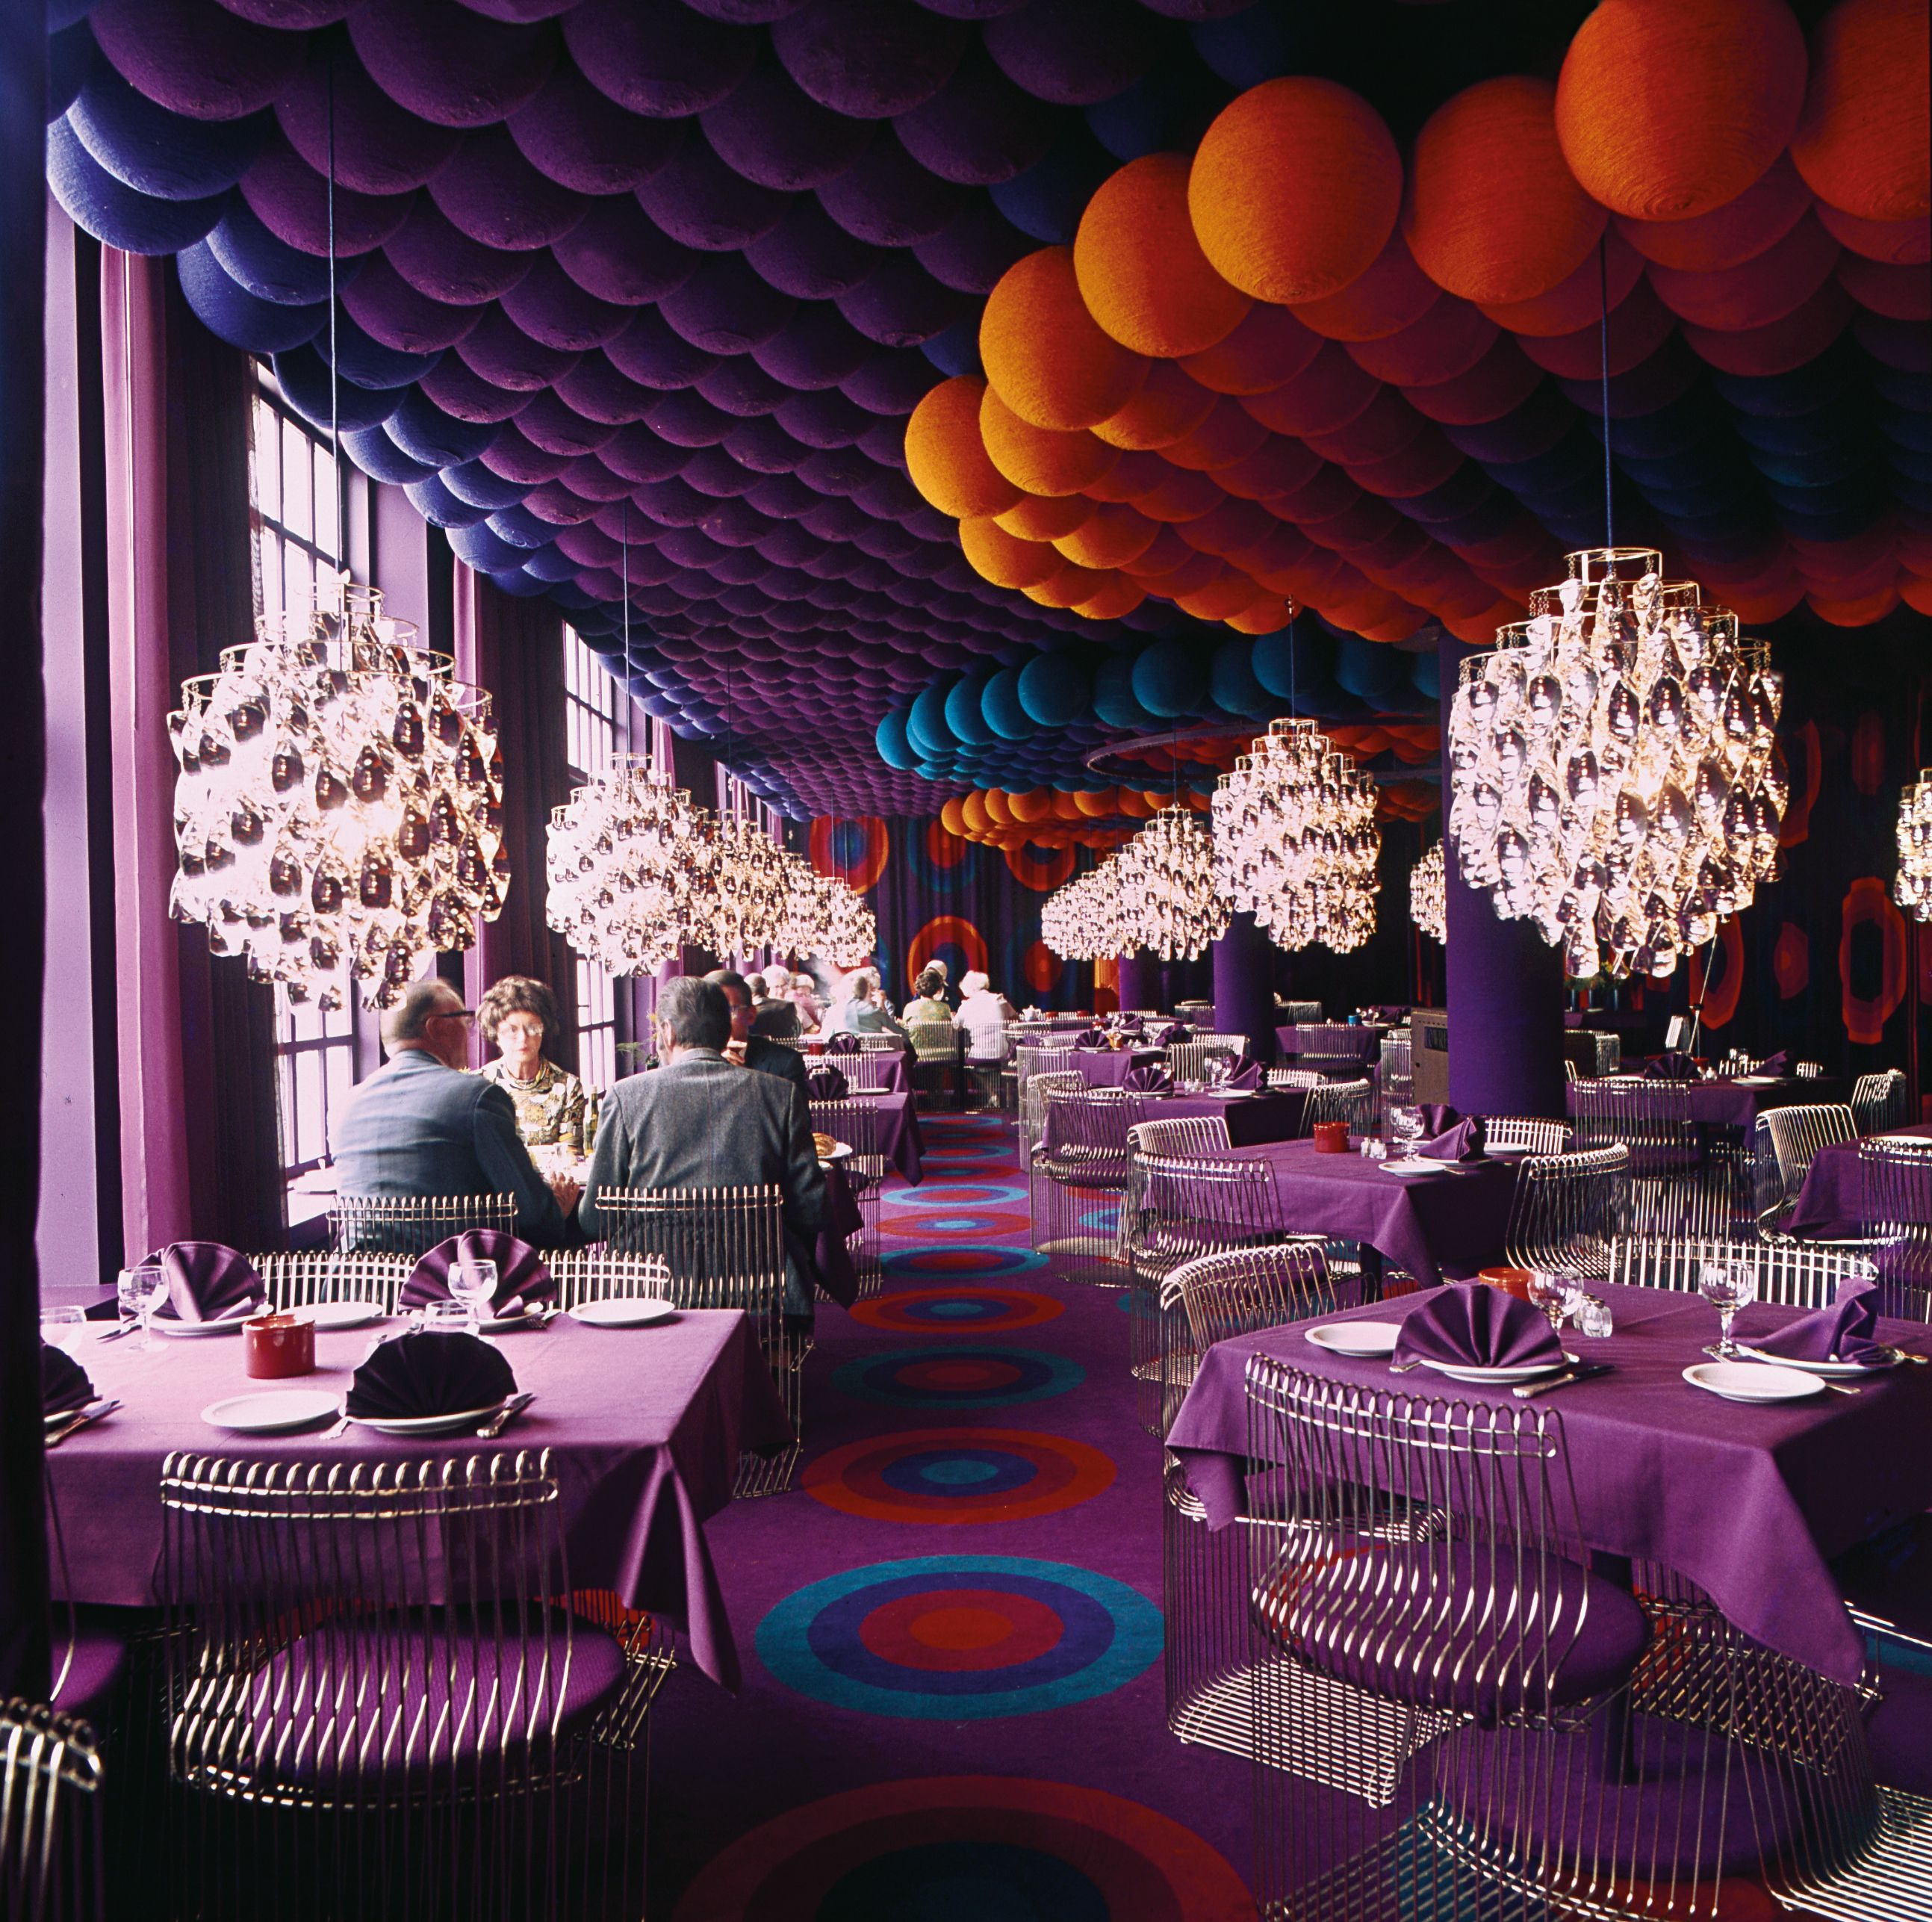 Verner panton interior design - Arna Restaurant Rhus Denmark 1971 Designed By Verner Panton